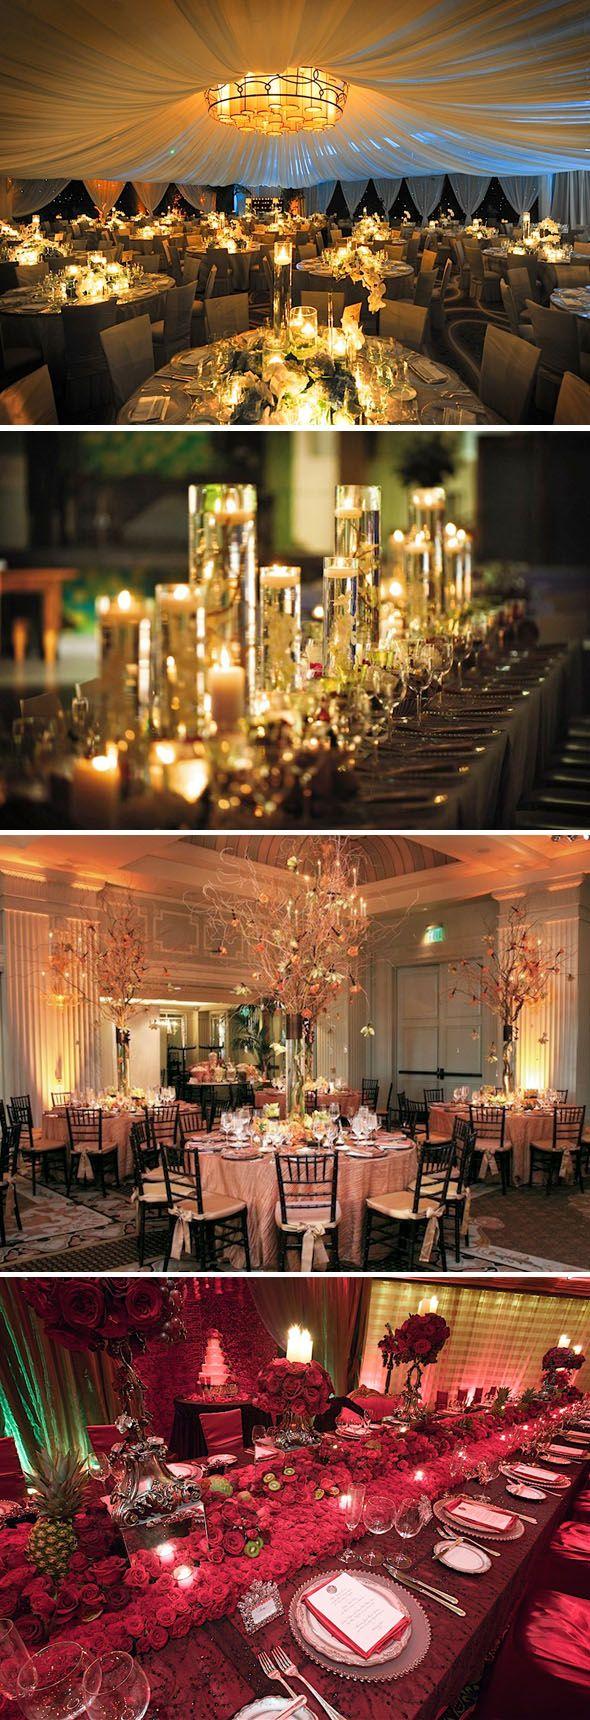 Candlelight & Centerpieces #Luxury #Wedding #Centerpieces